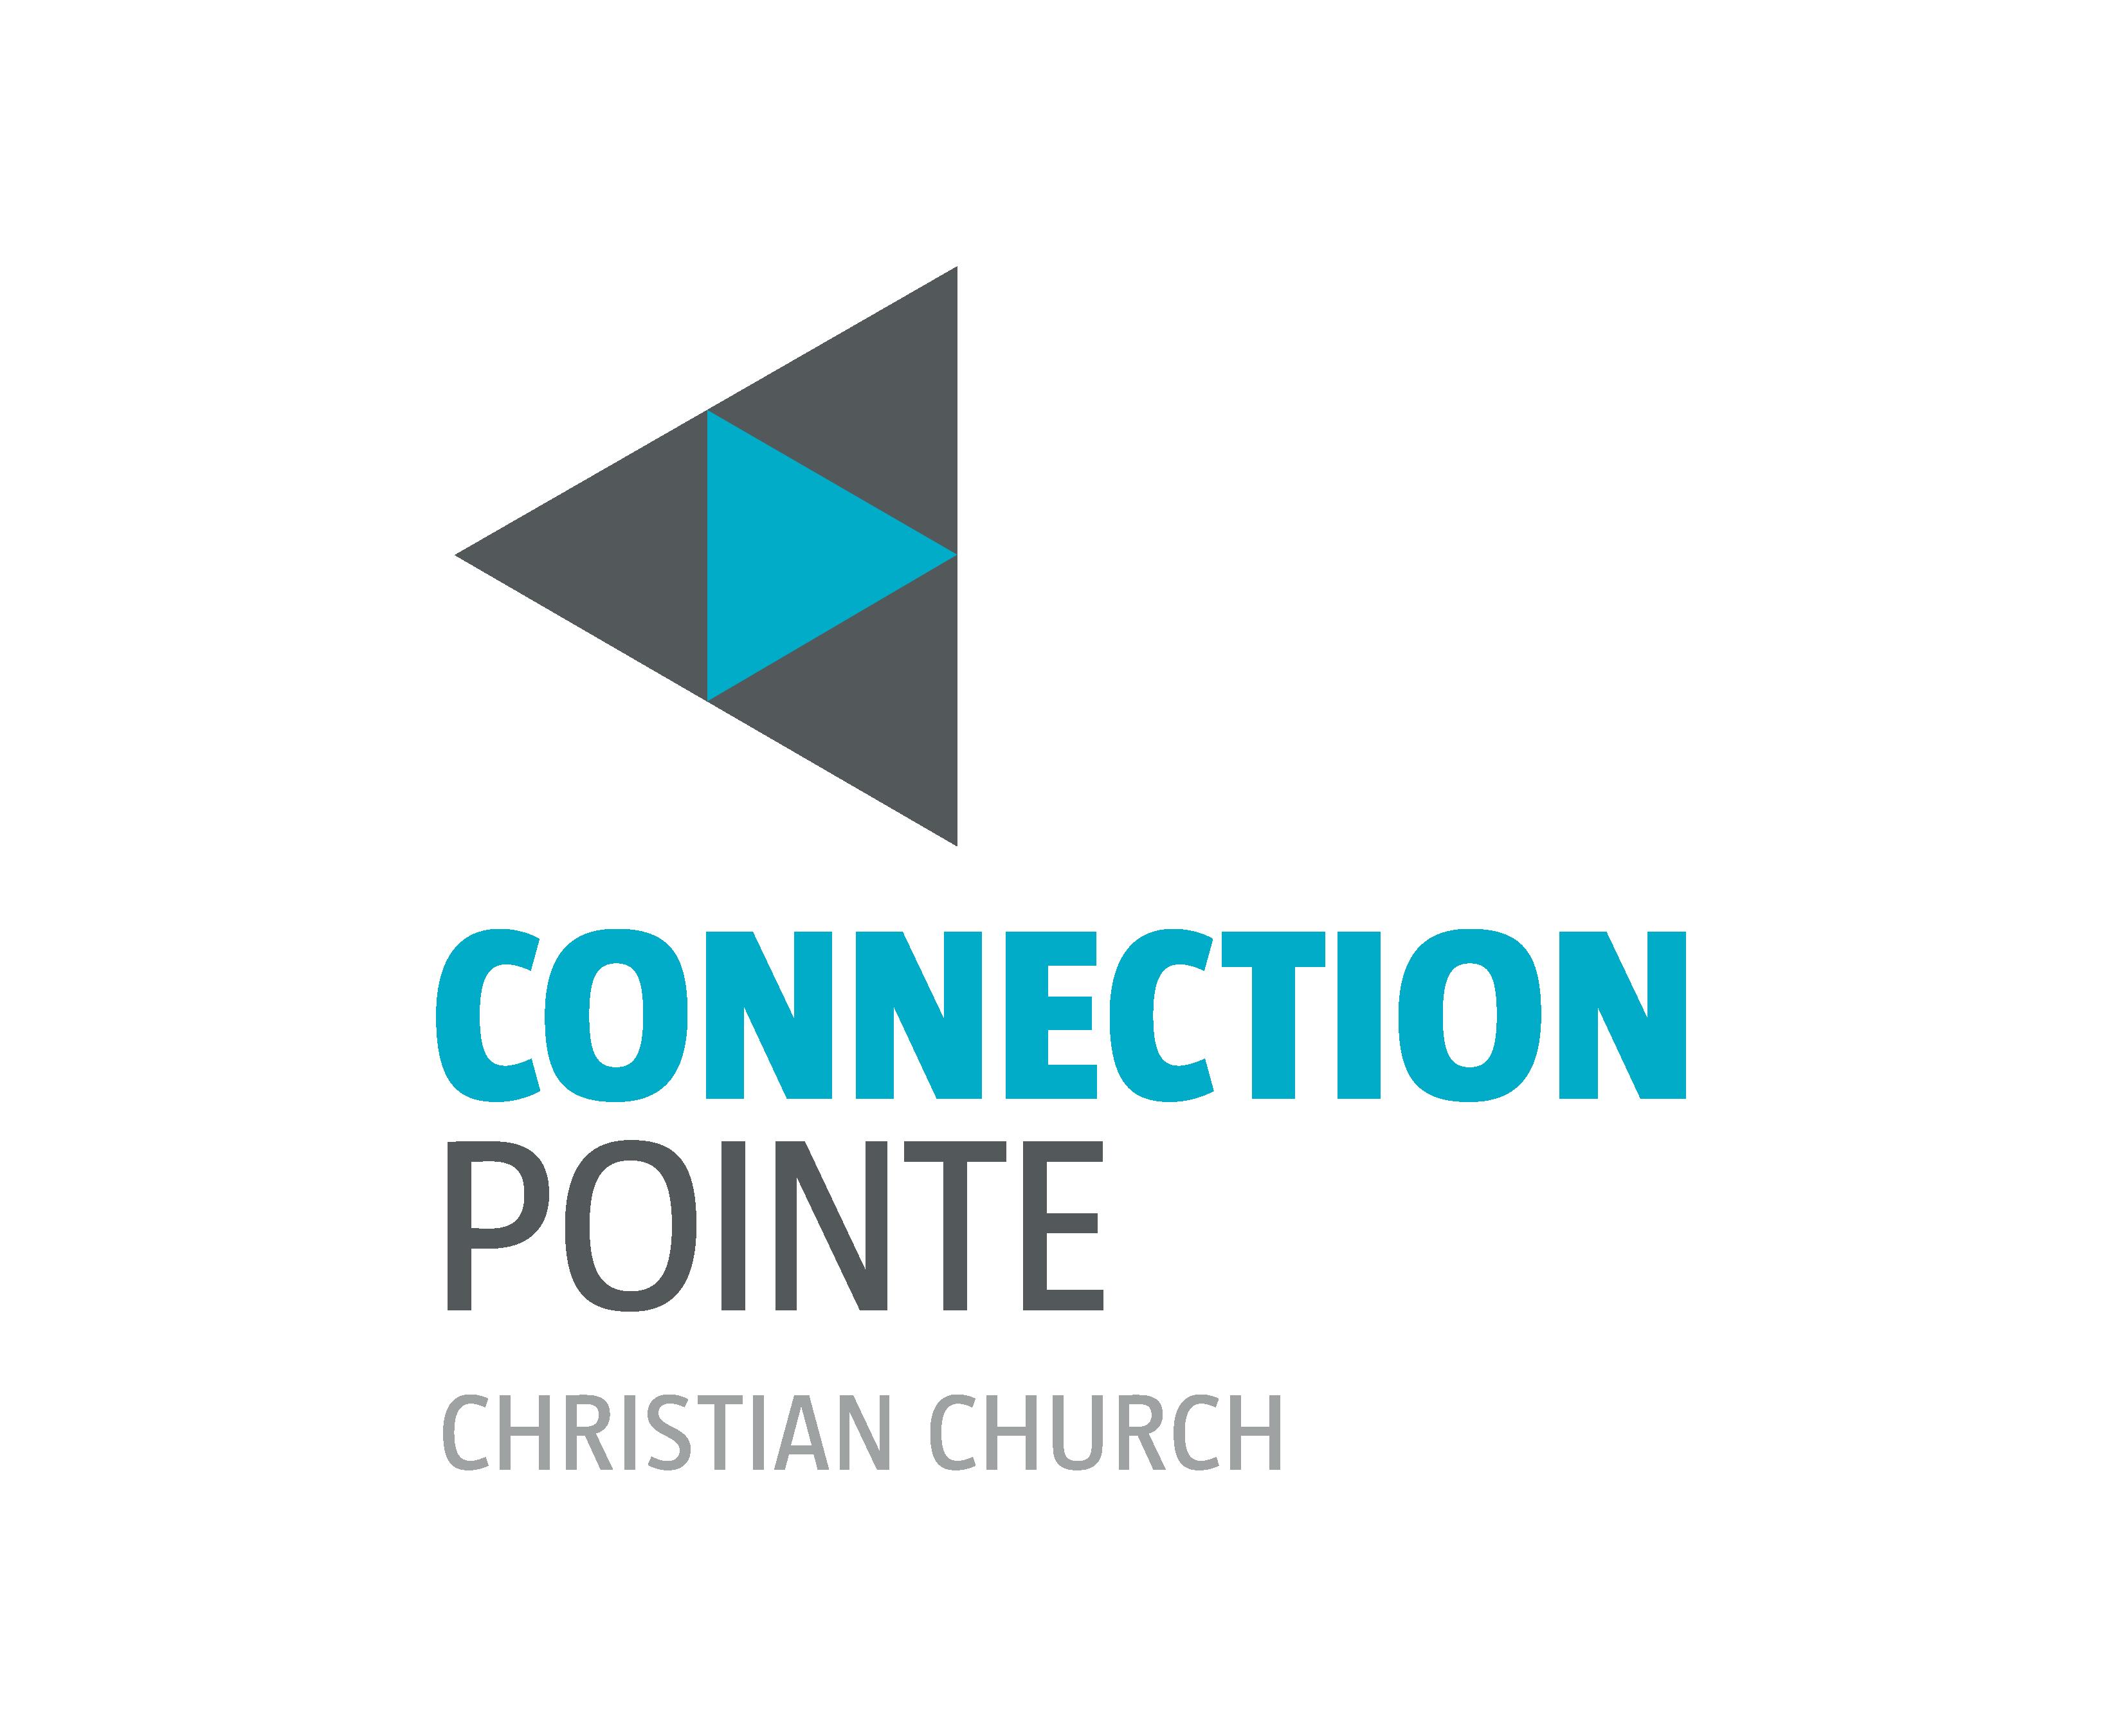 Connection Pointe Christian Church